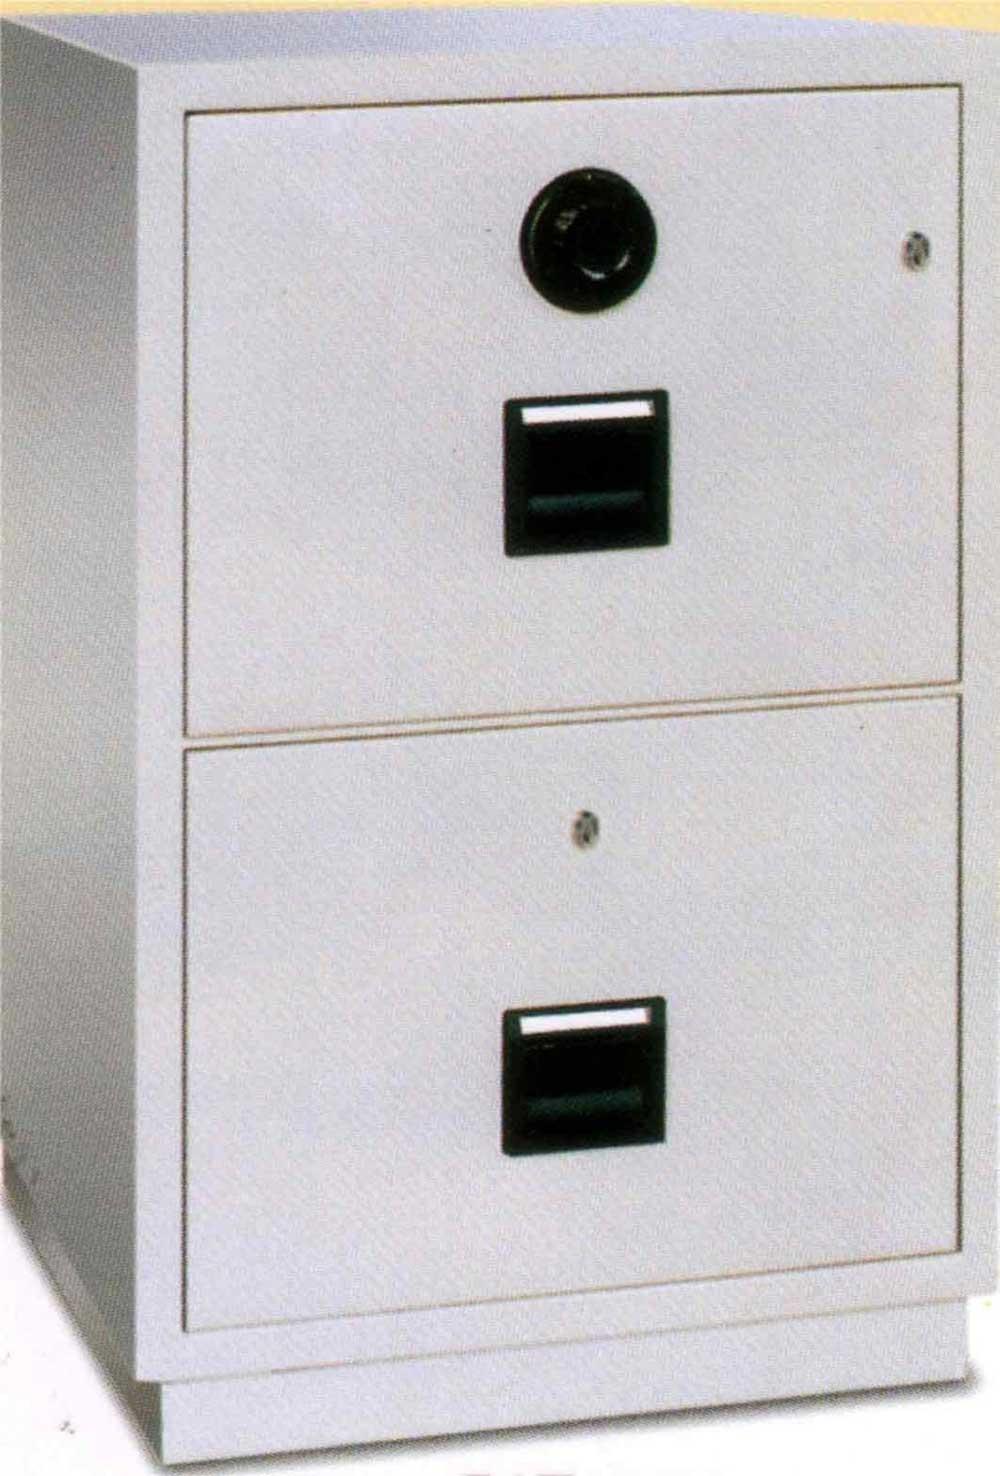 BIF Fireproof File Cabinets